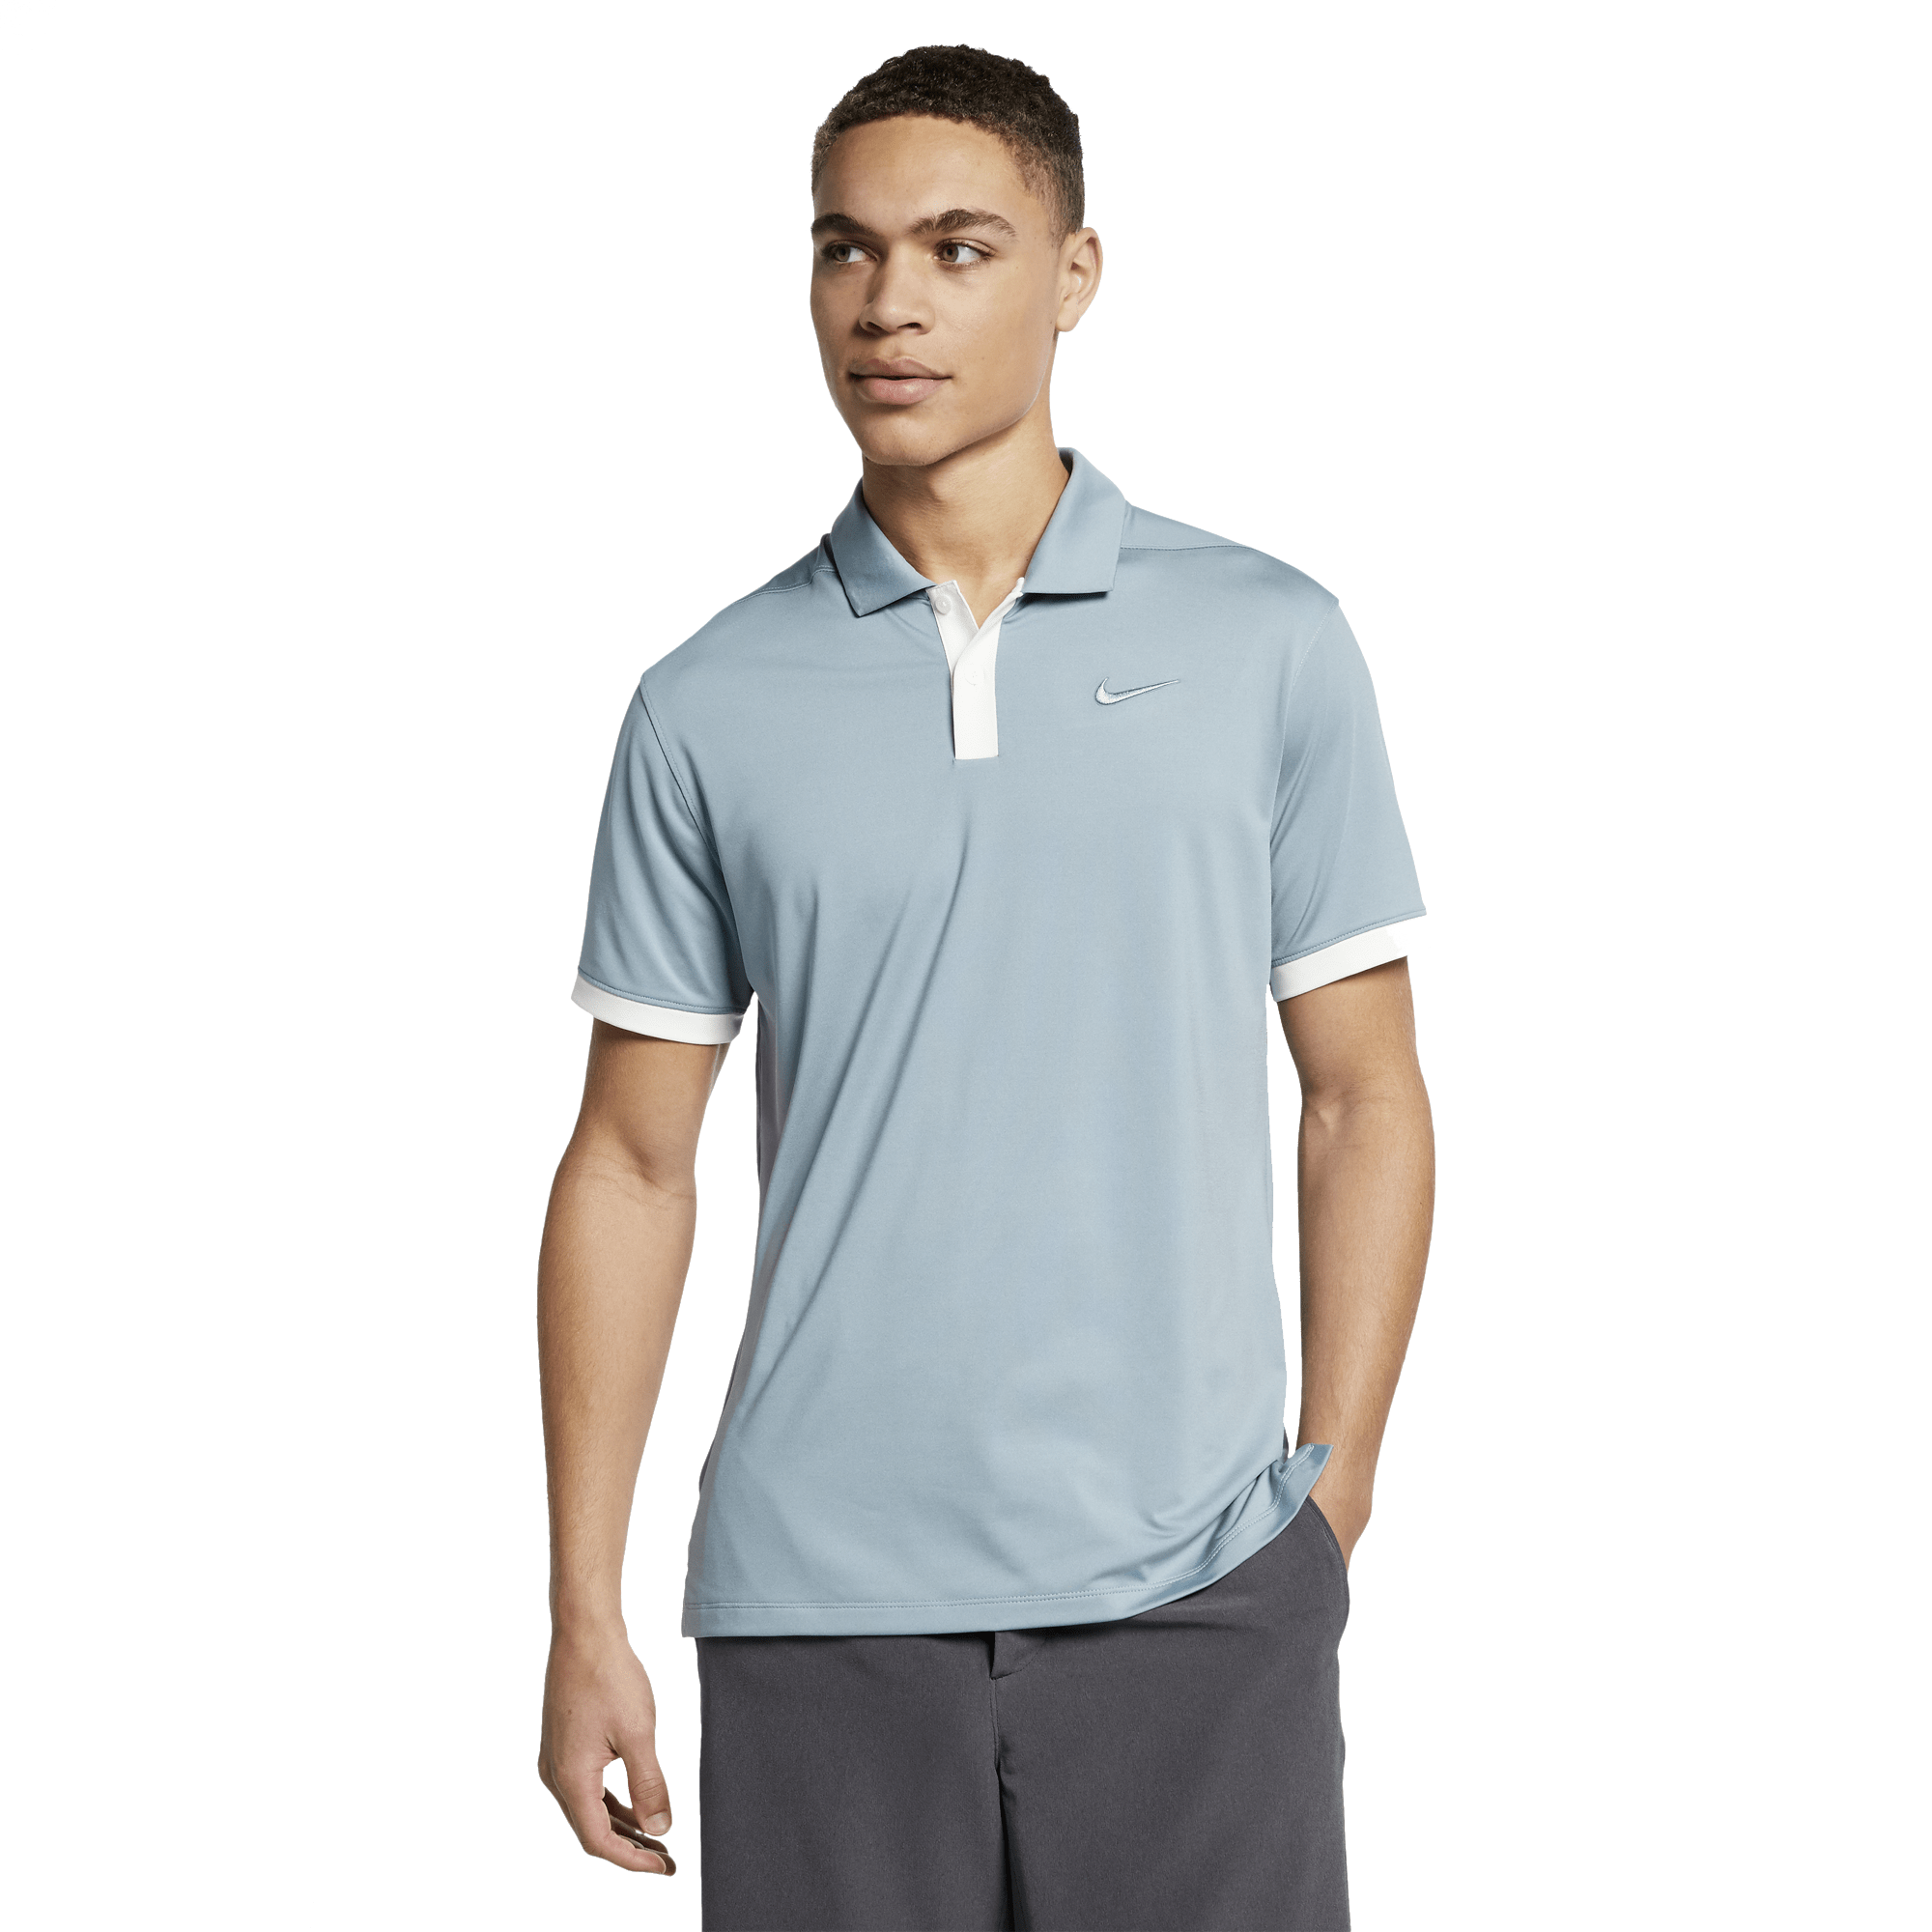 Nike Dri-Fit Vapor Solid Polo   PGA